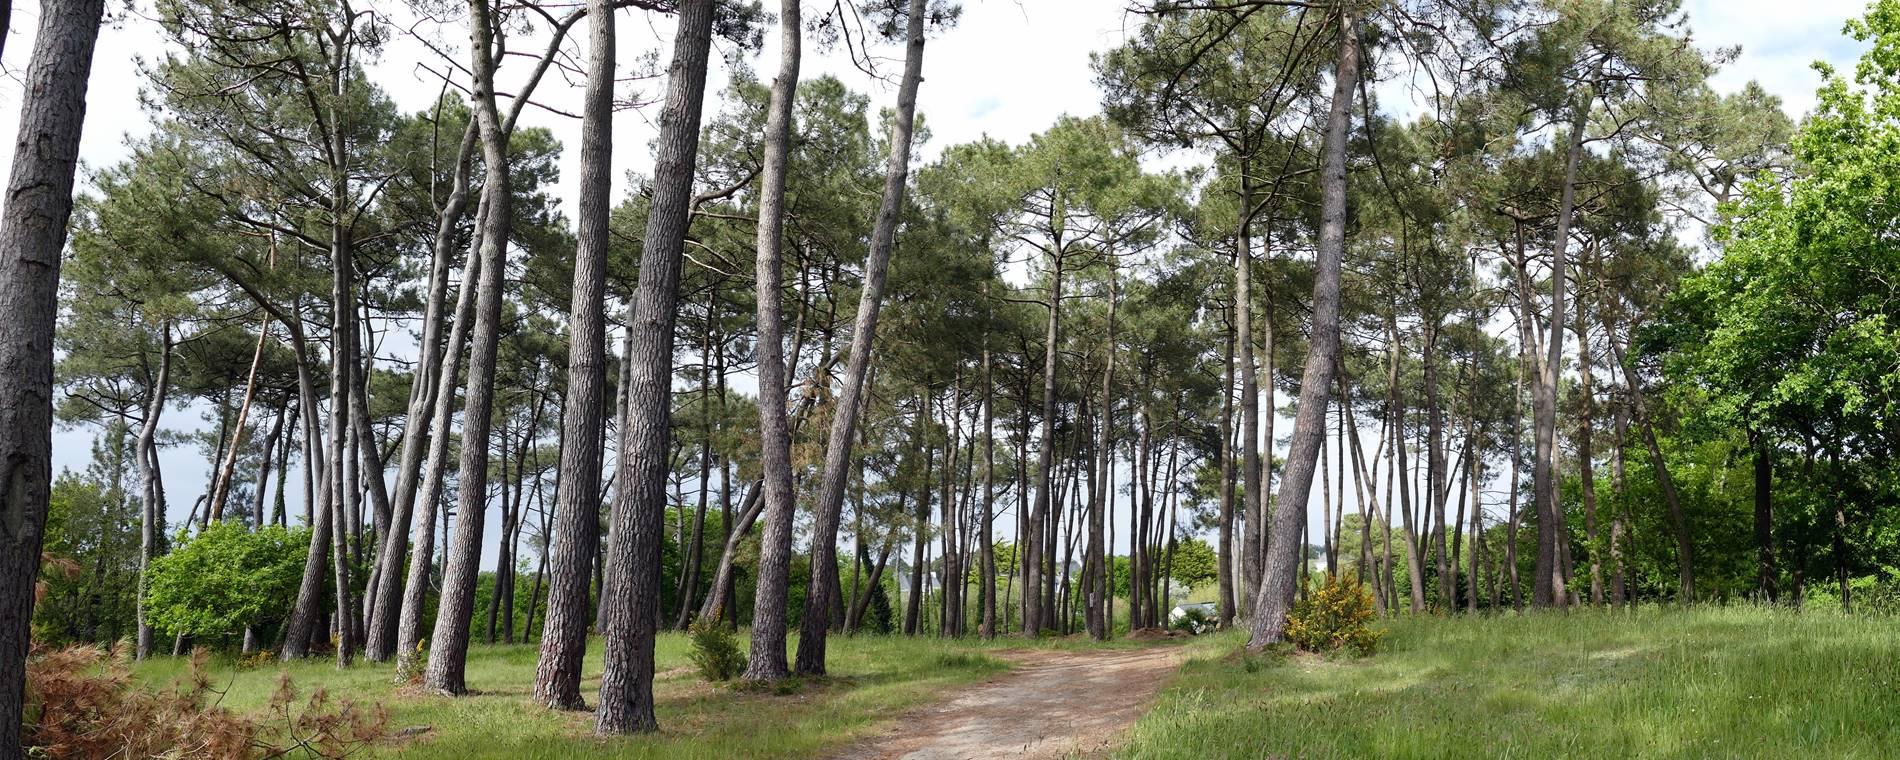 Bois du camping ©